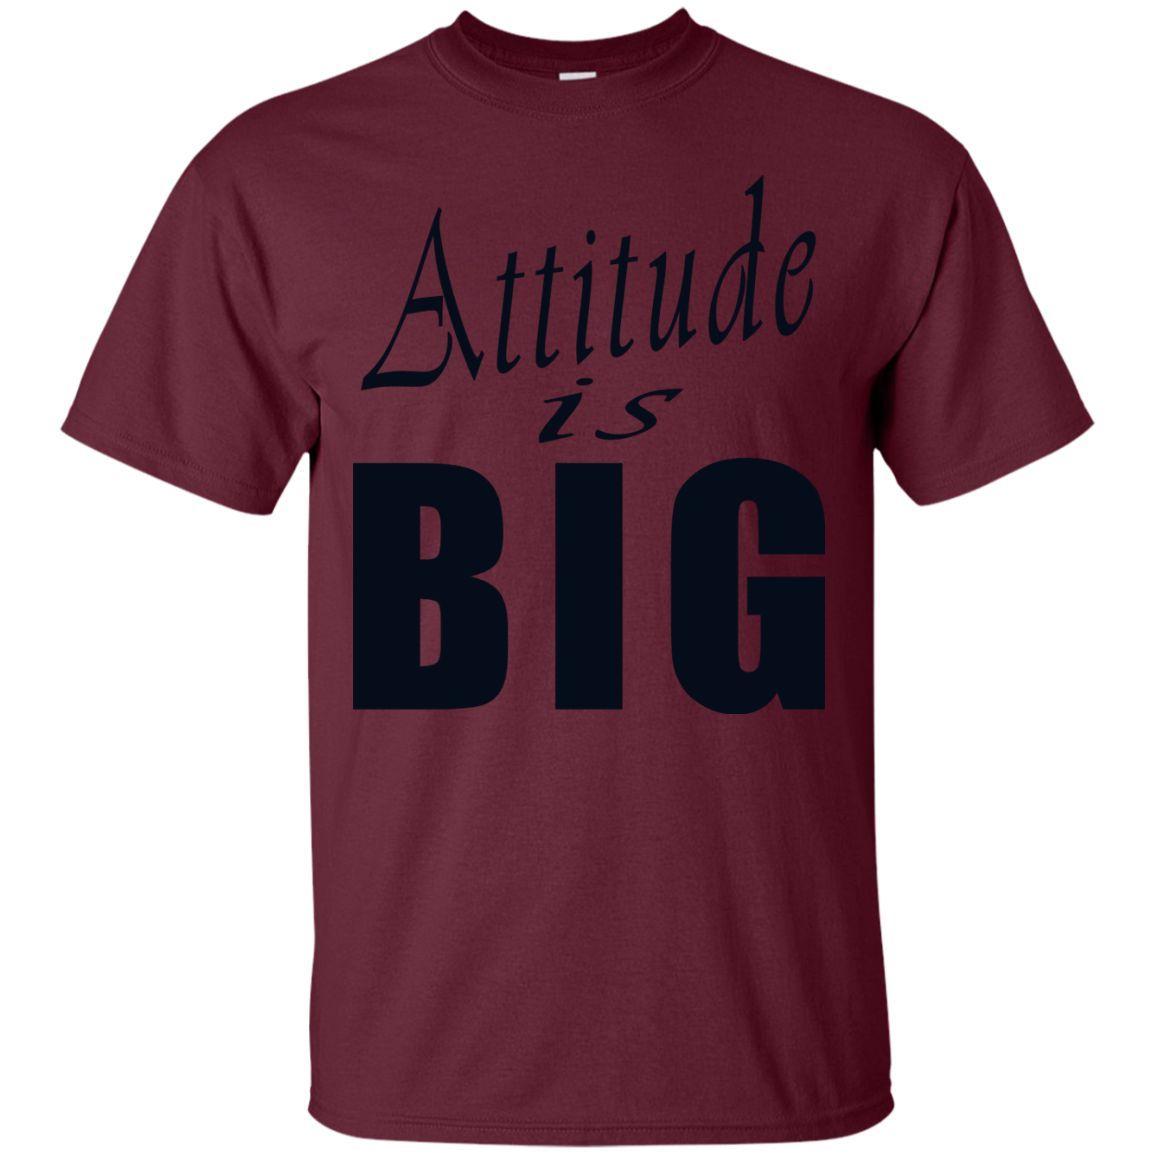 Attitude is Big/ T-Shirt